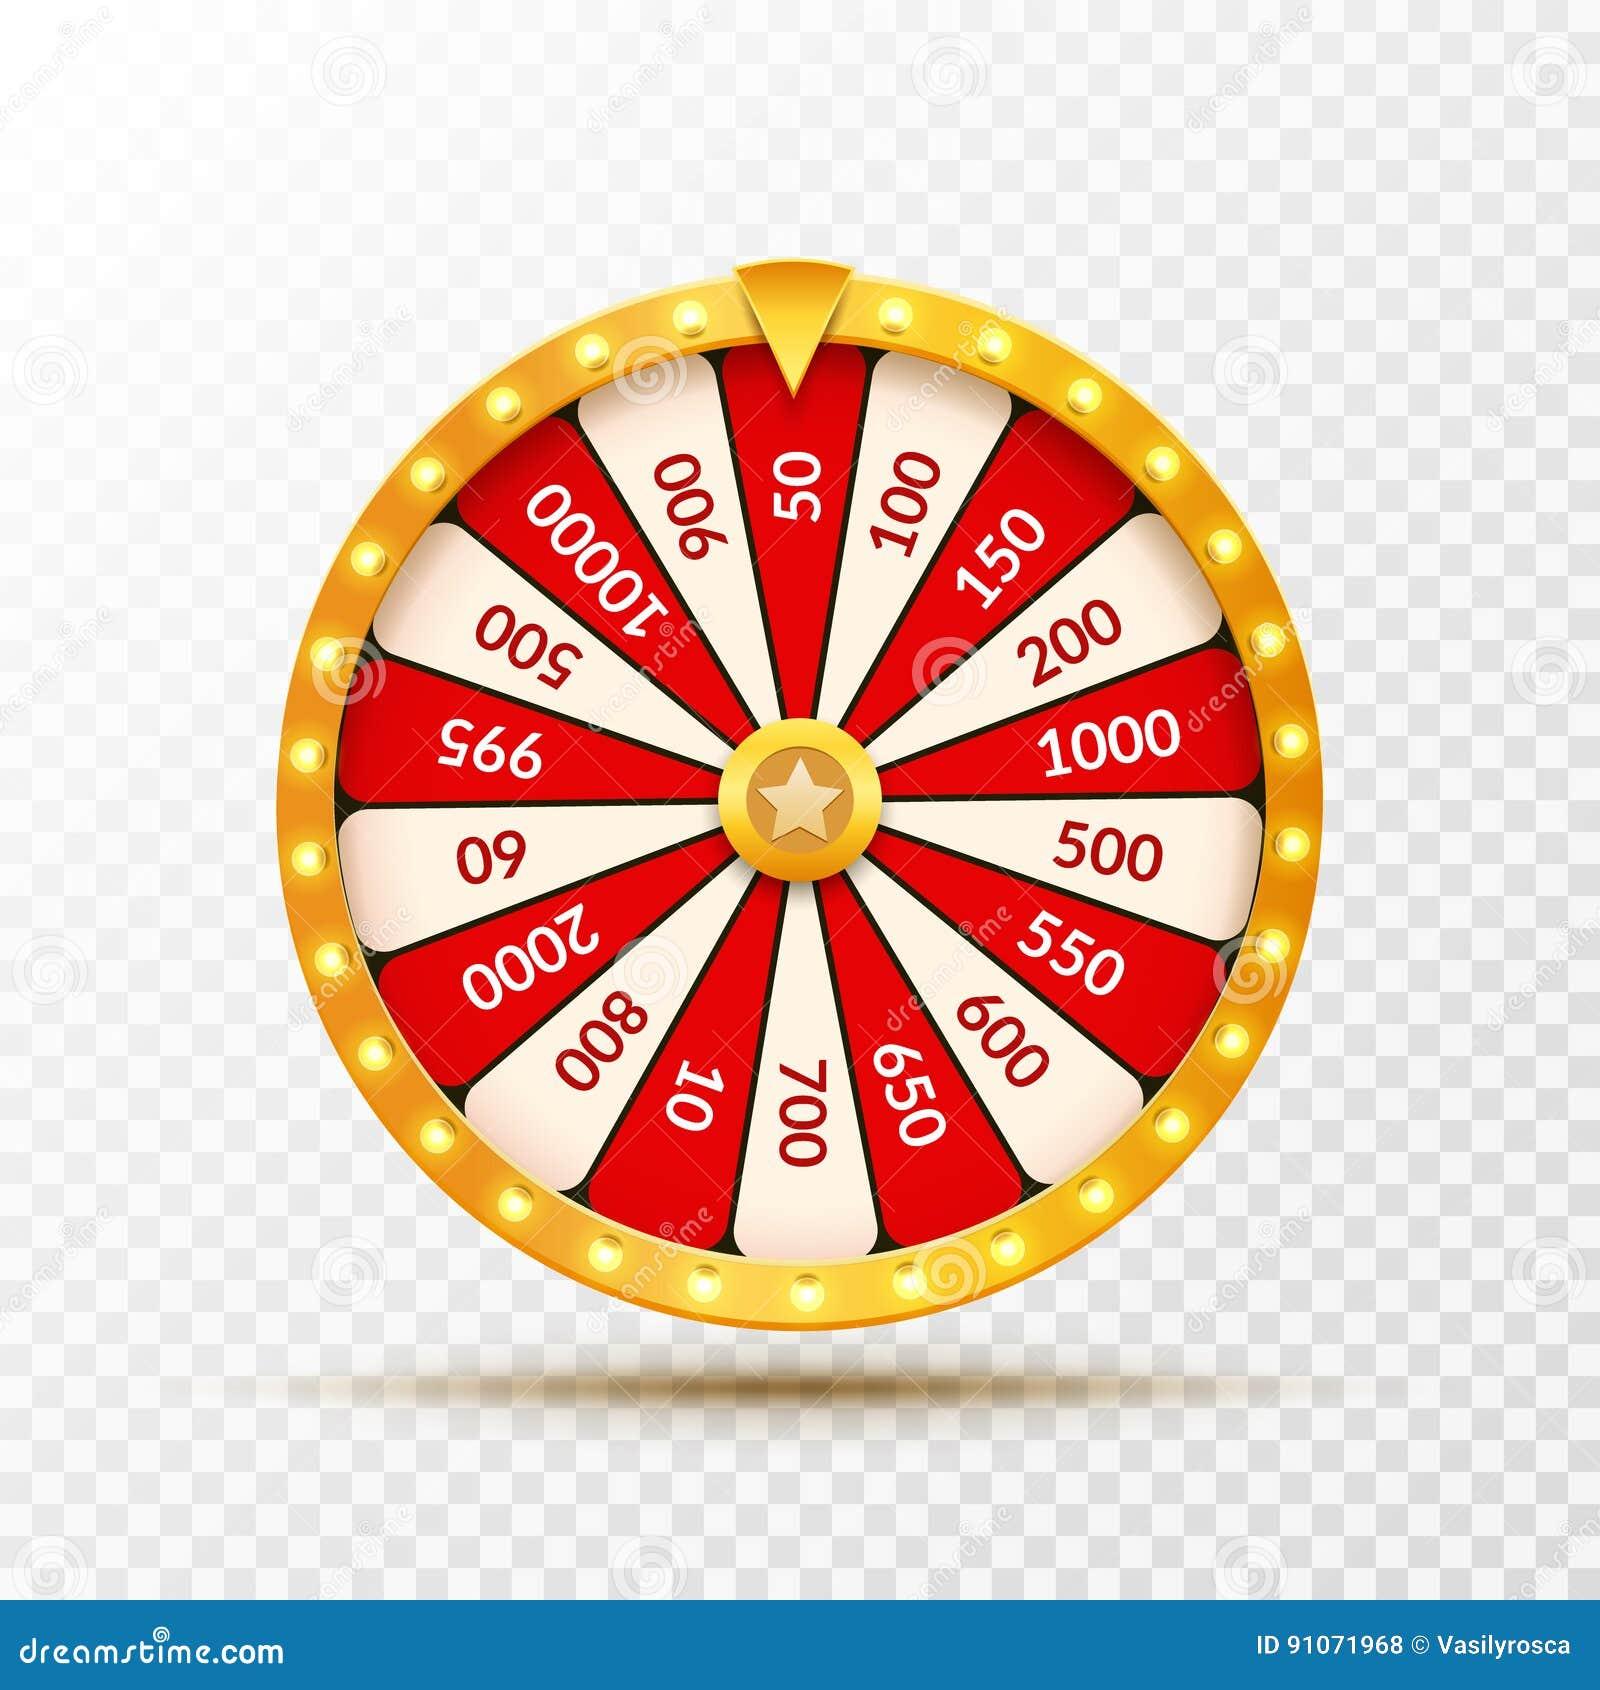 Ladbrokes blackjack promotion code